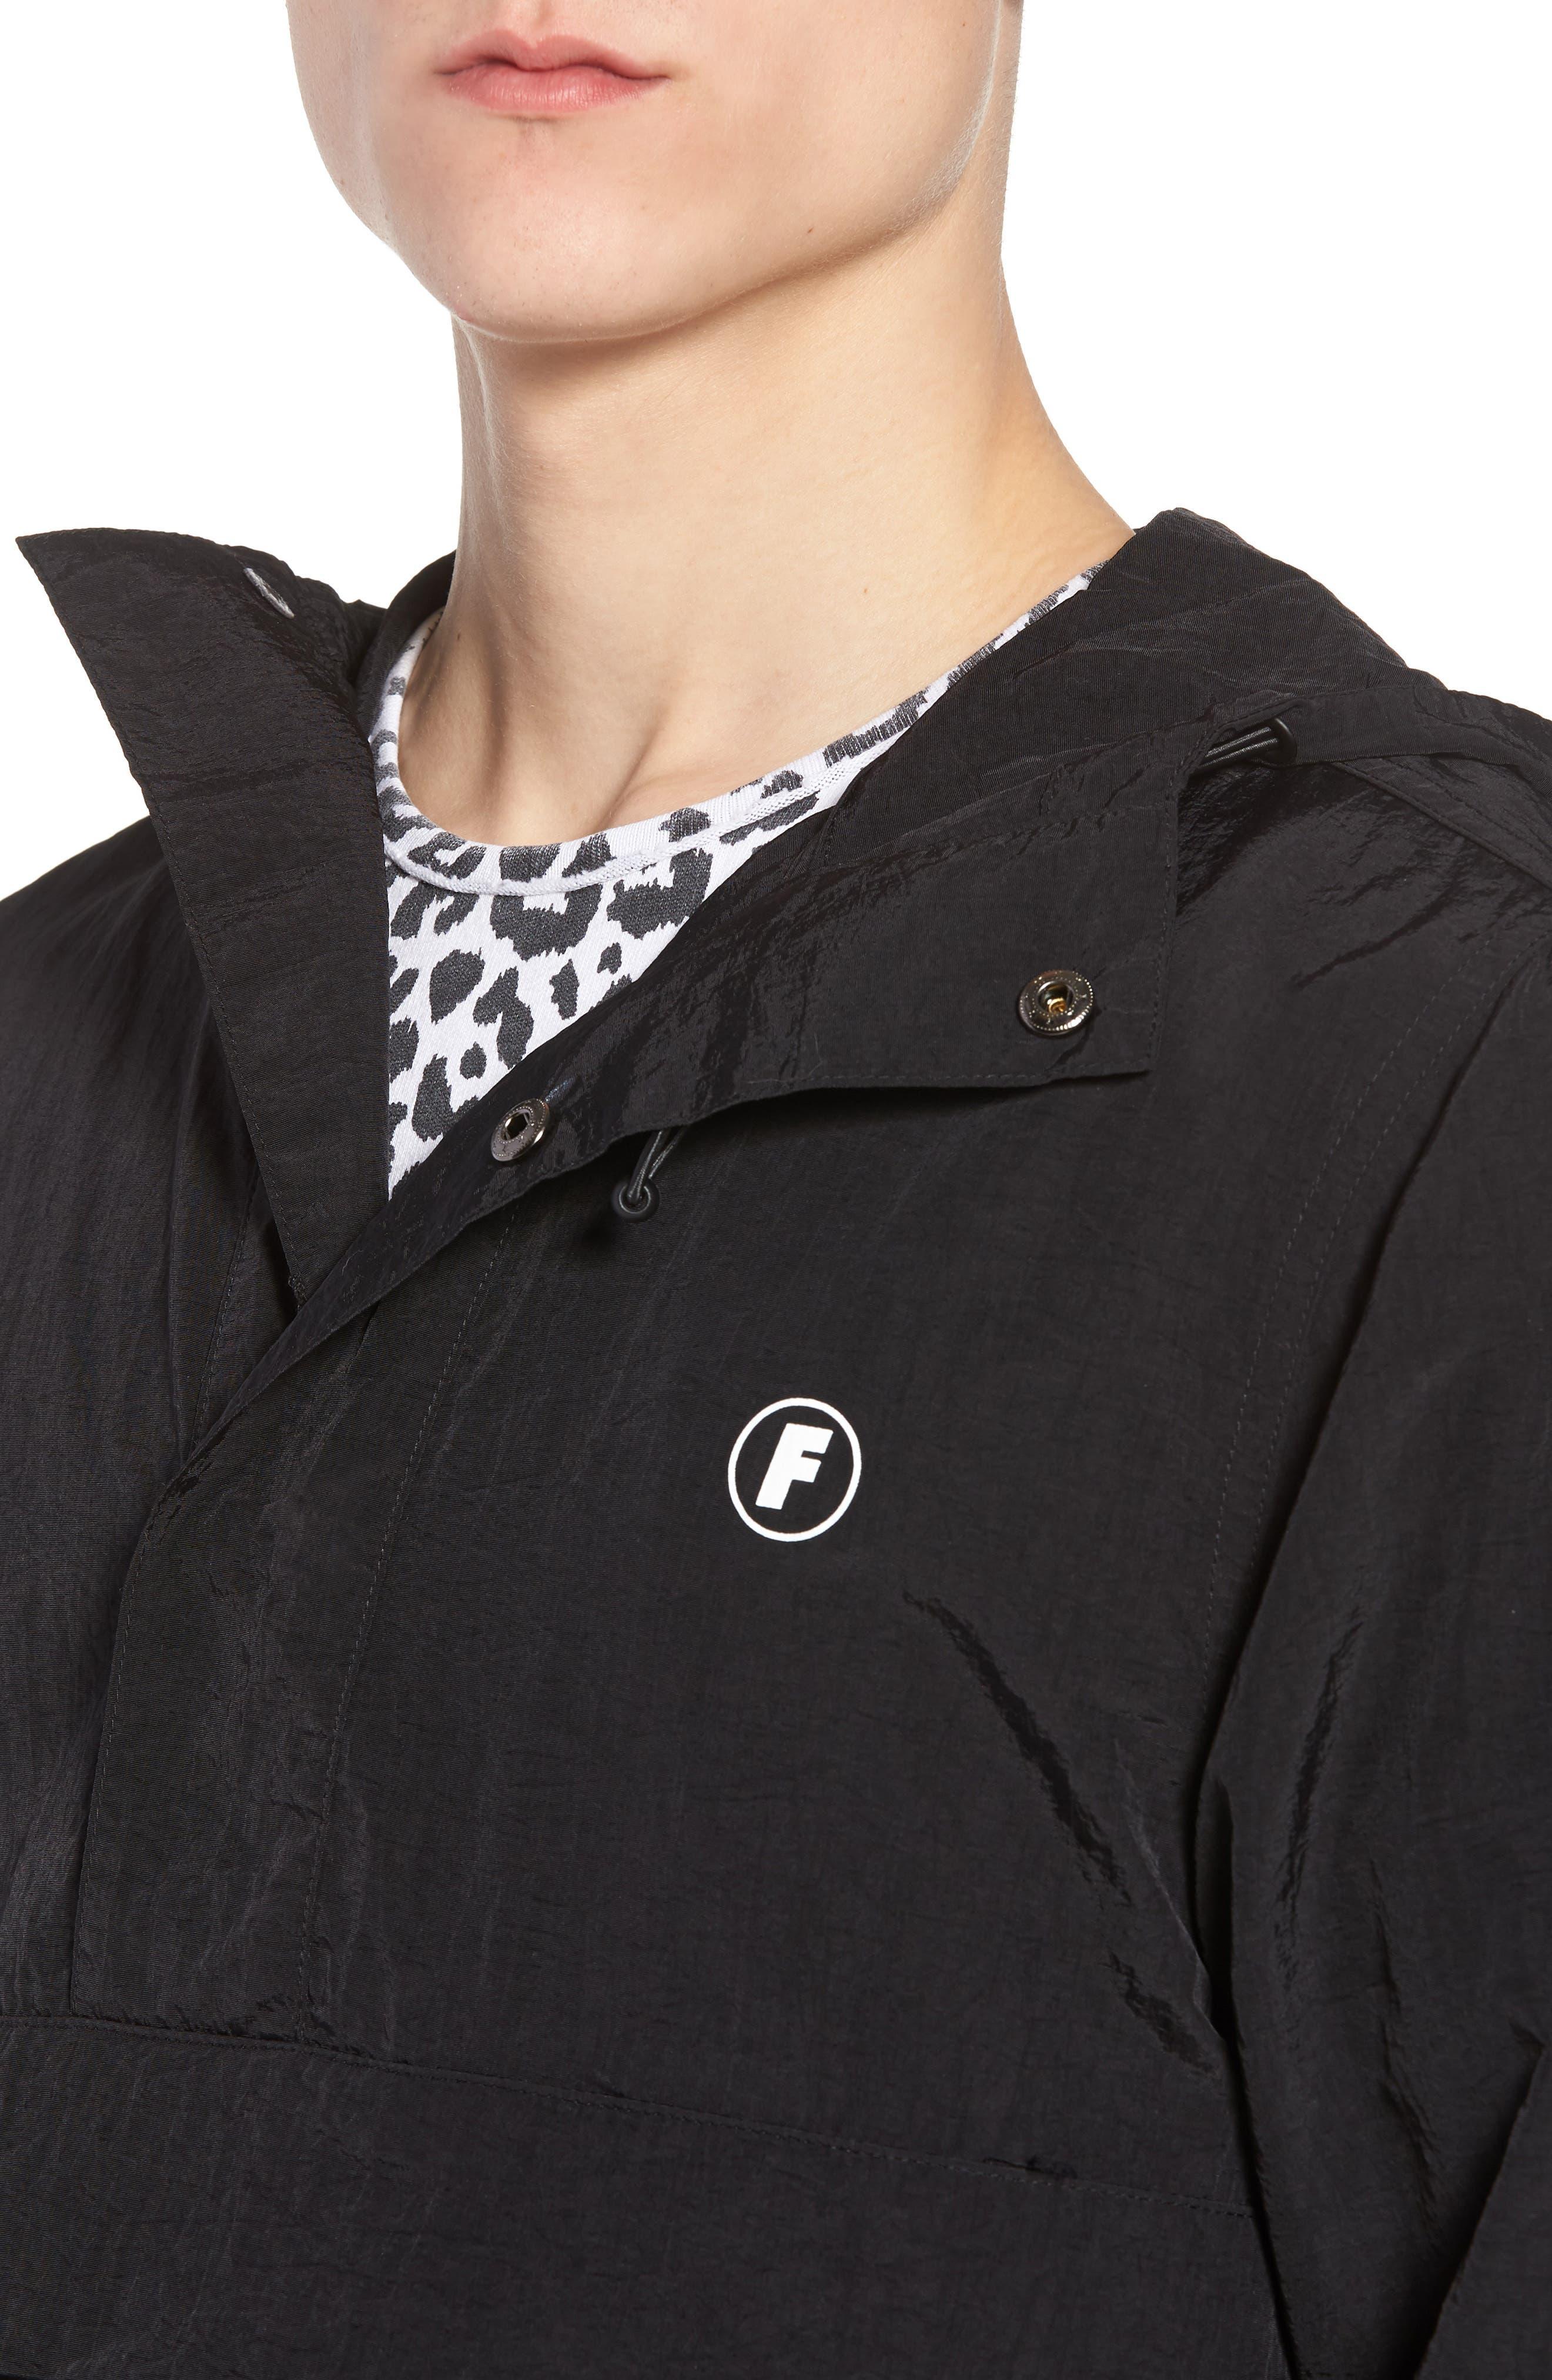 Tillman Packable Anorak Jacket,                             Alternate thumbnail 4, color,                             Black